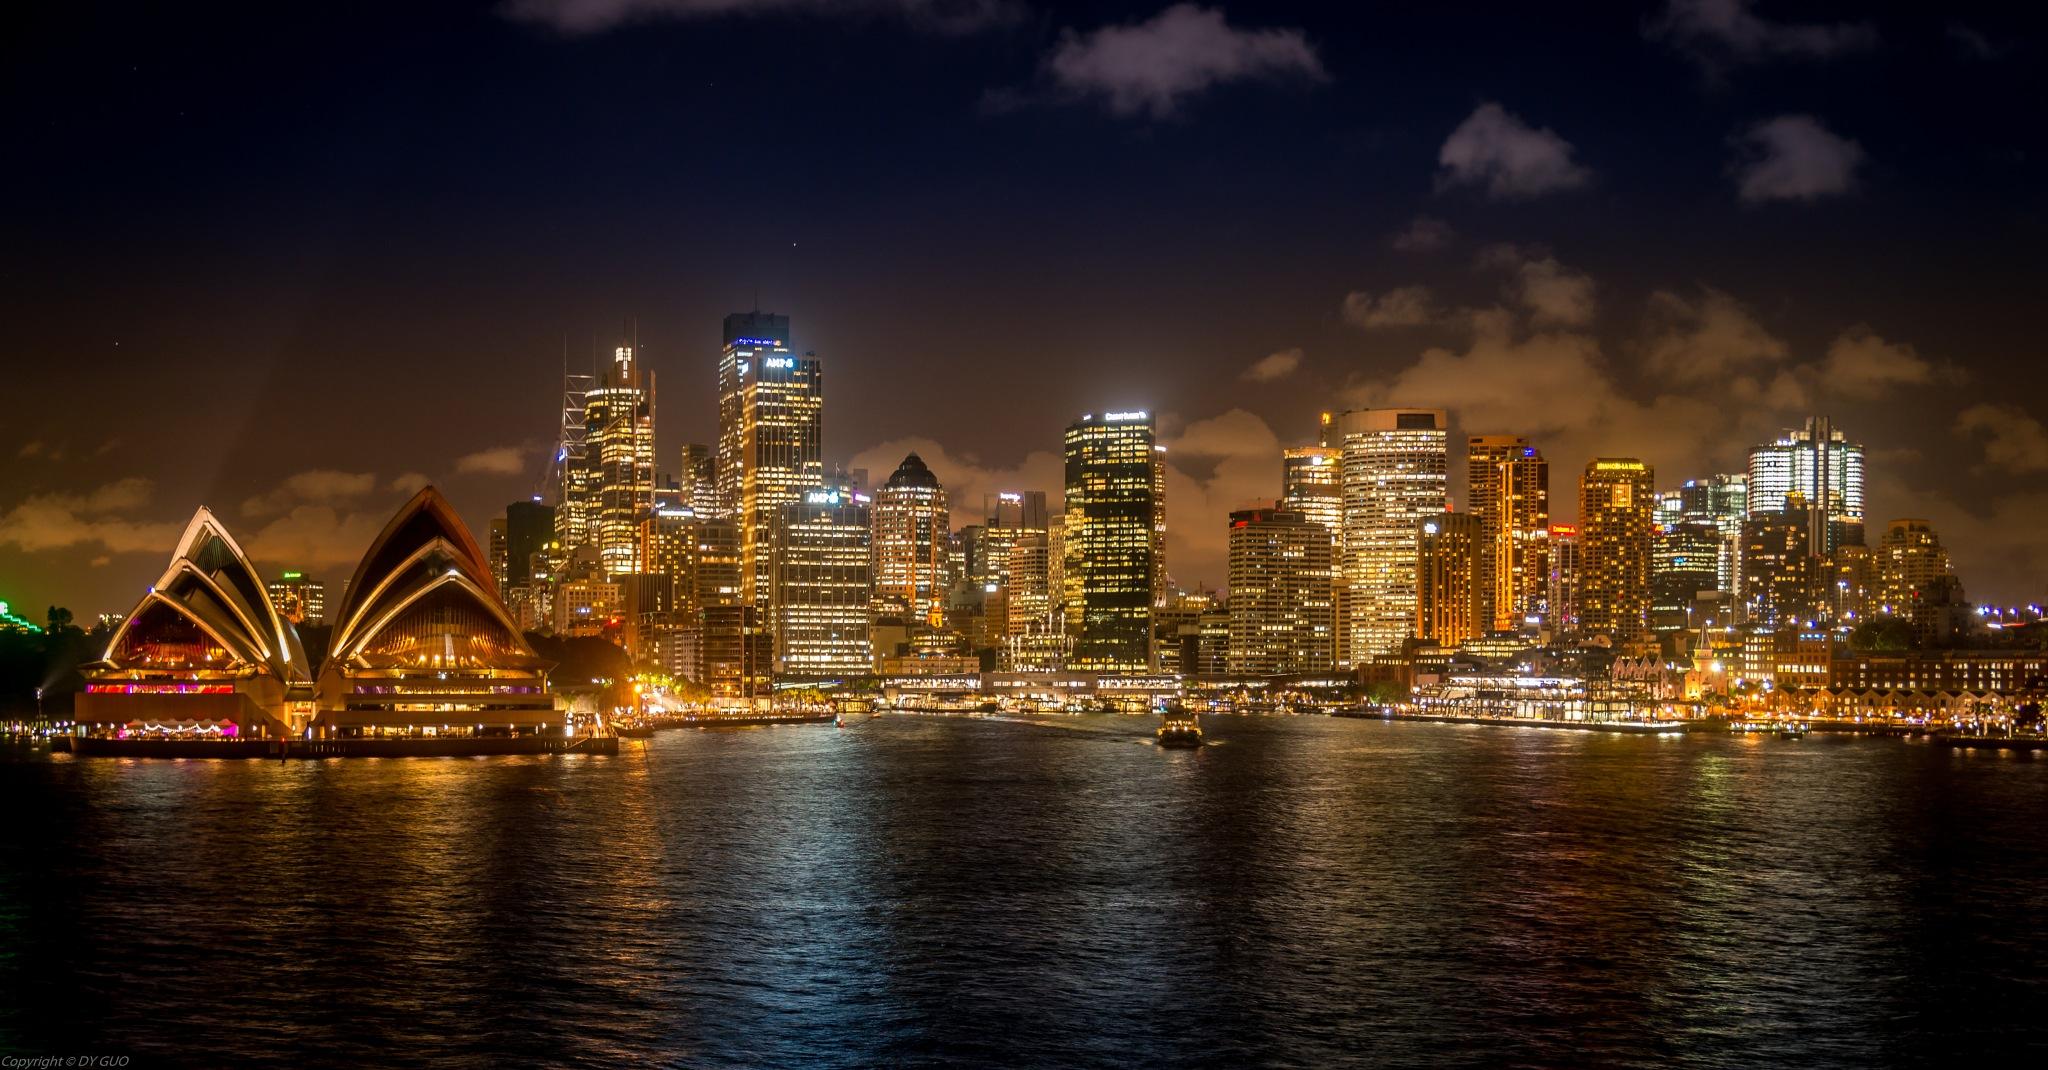 Sydney harbor at evening by David Guo